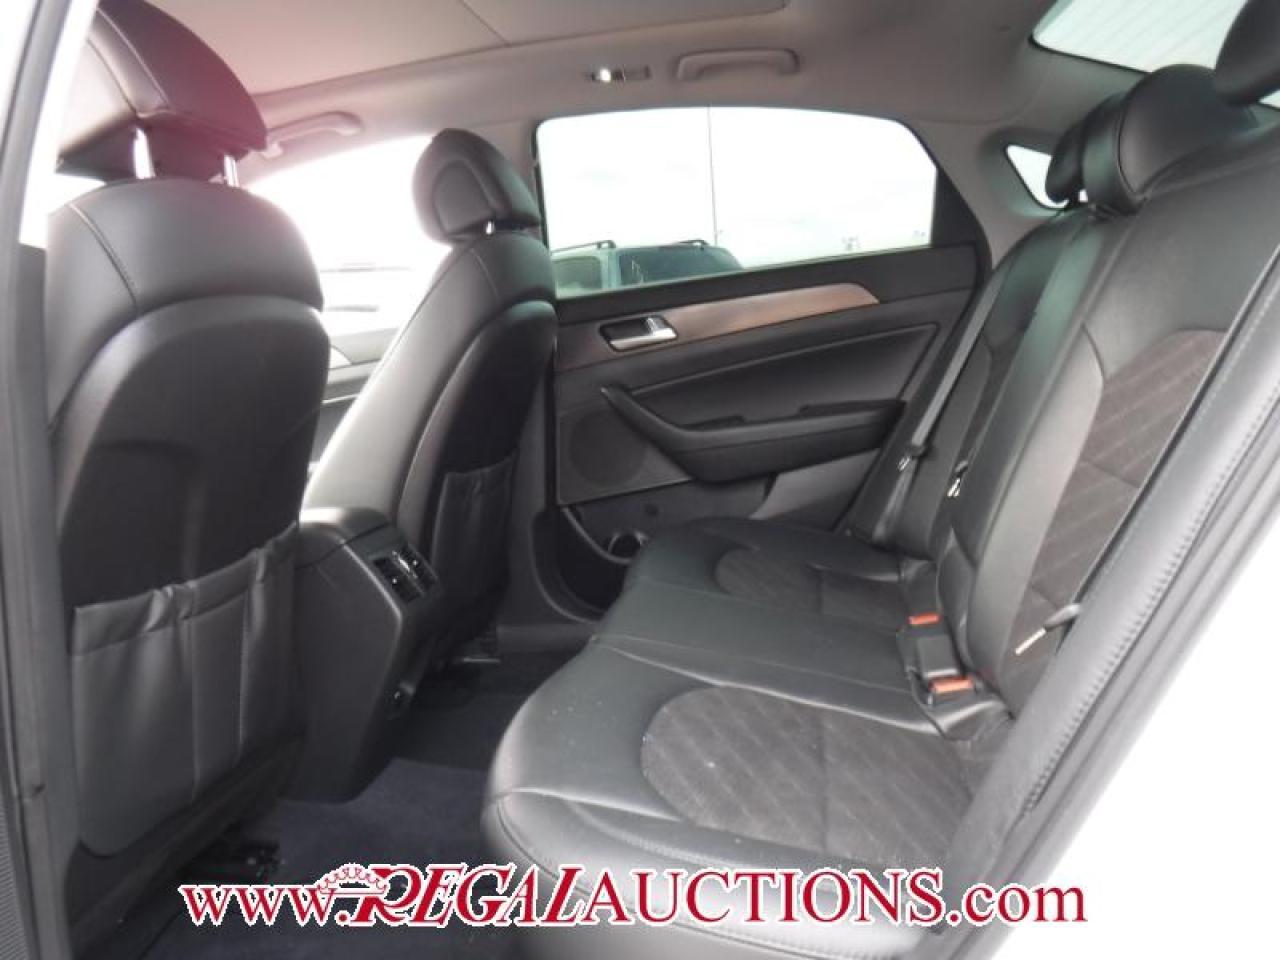 2015 Hyundai SONATA SPORT 4D SEDAN 2.4L